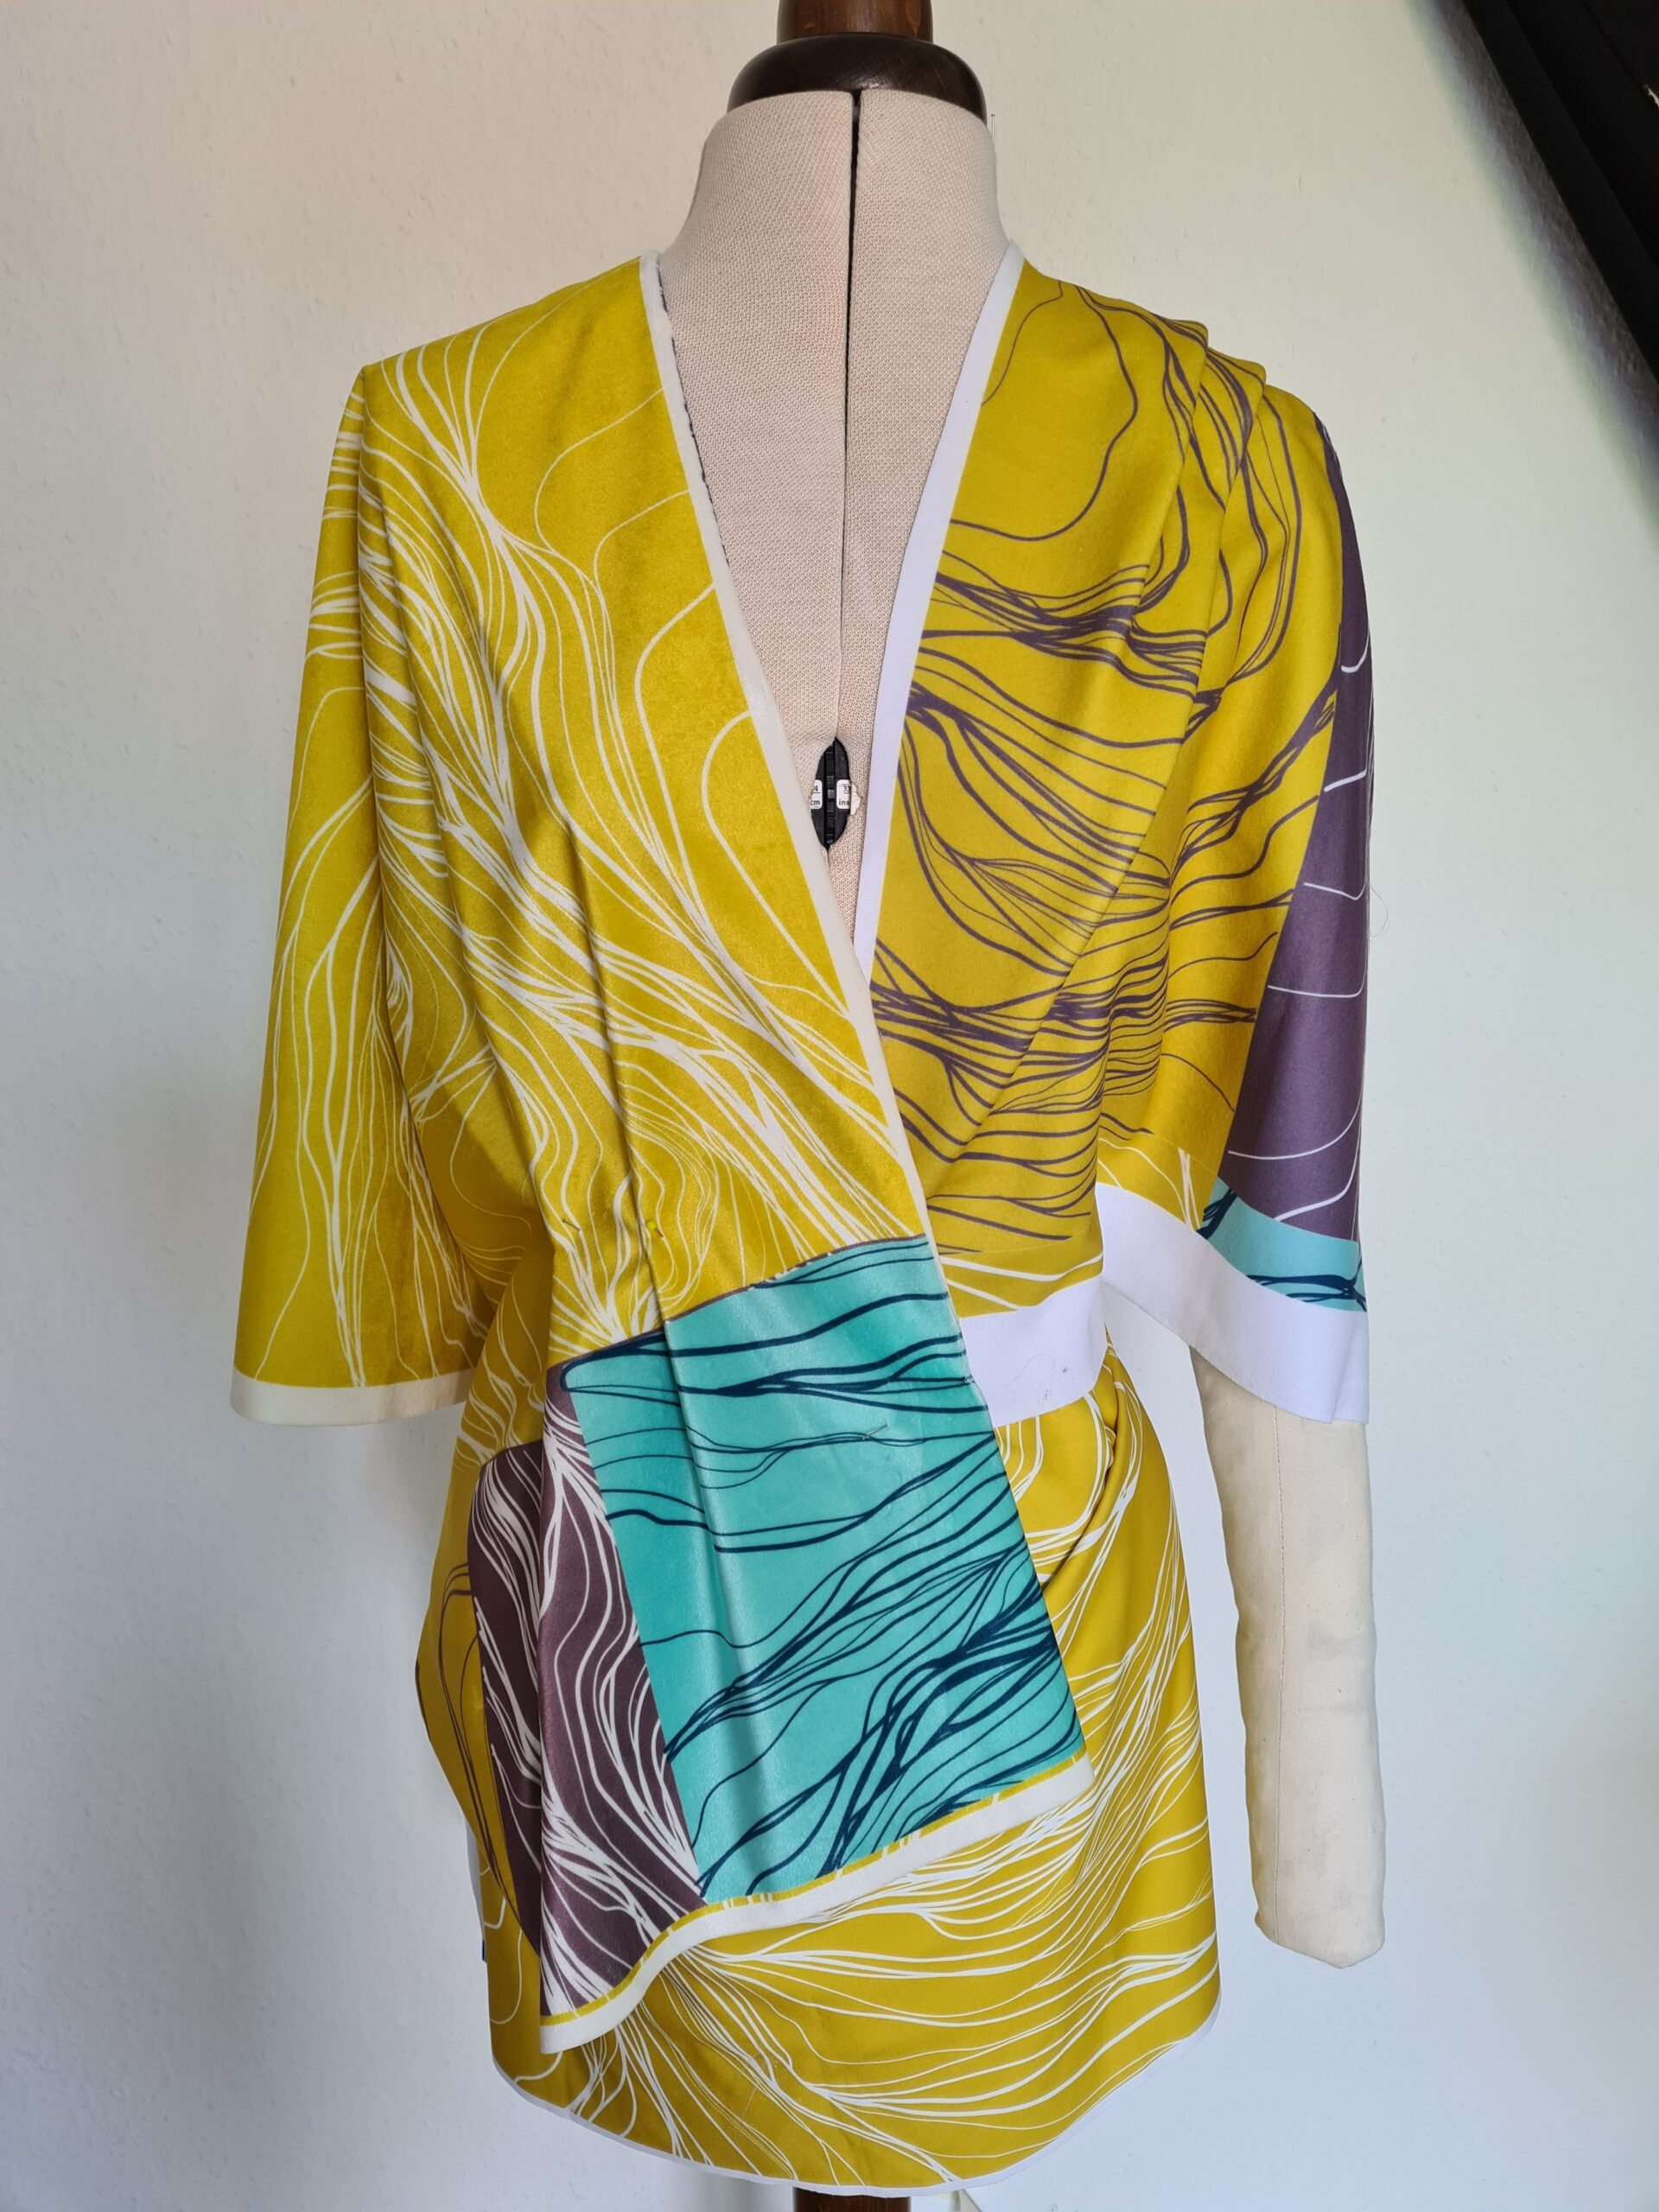 Draped fabric over a dress form